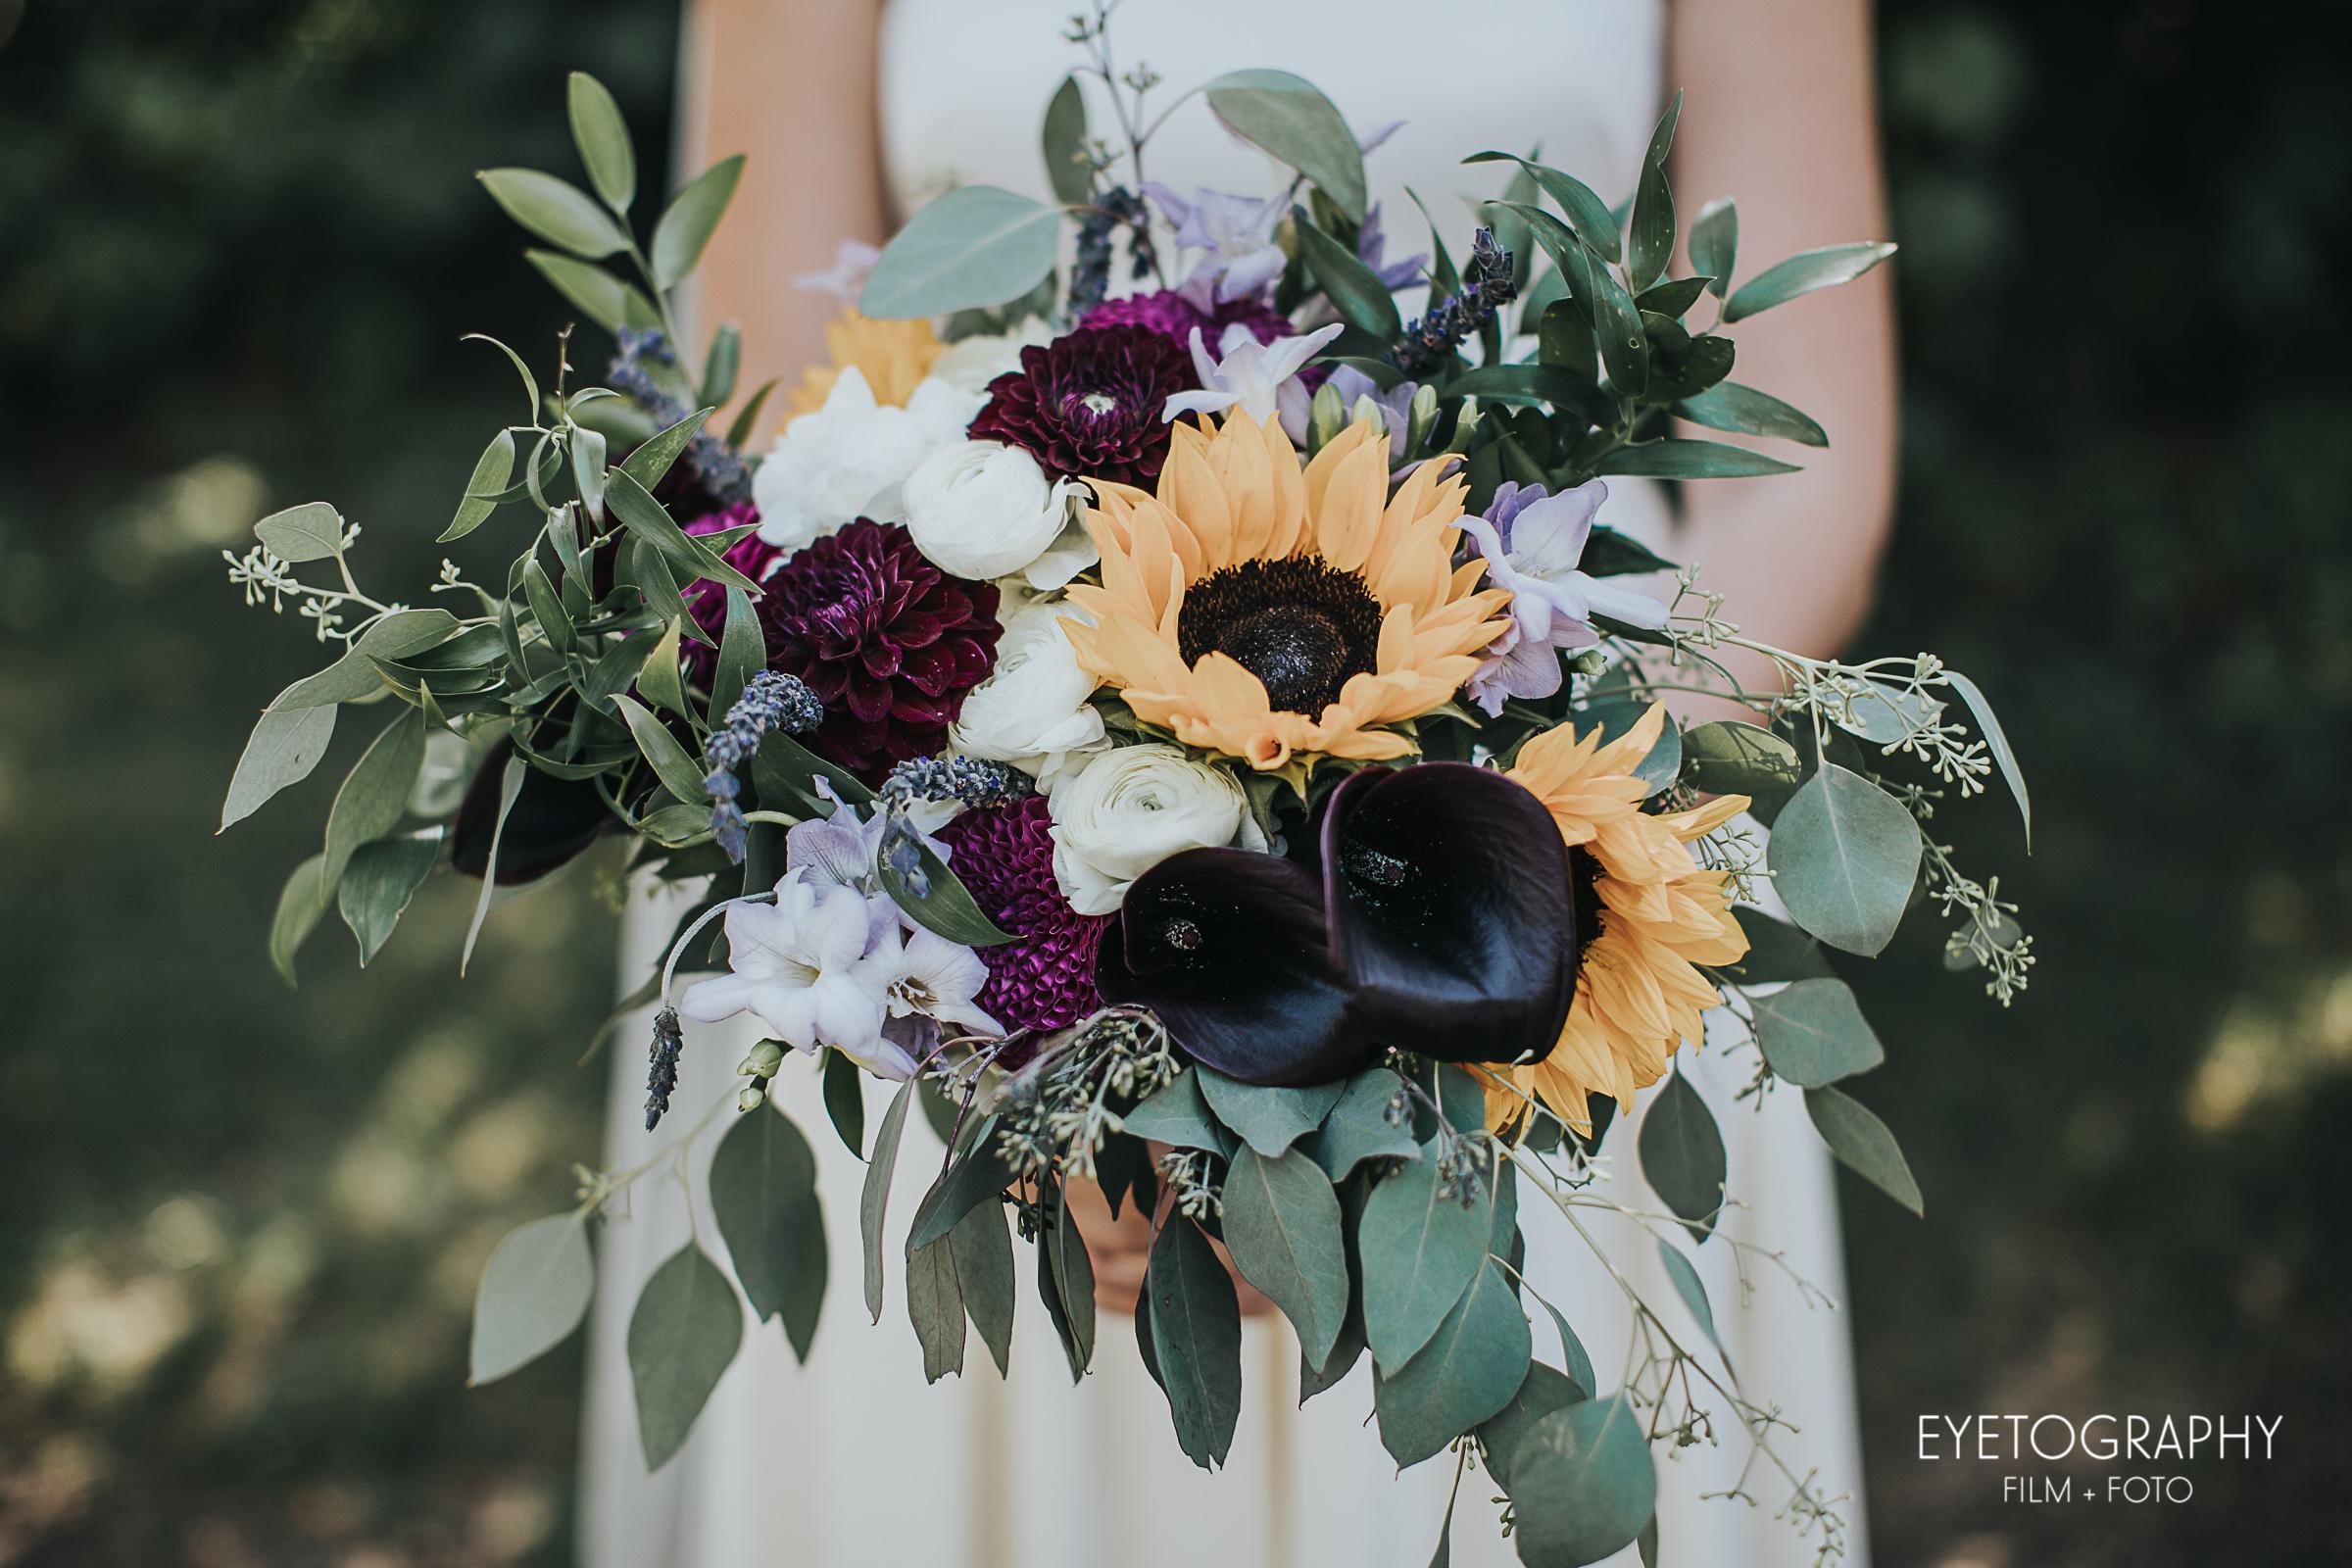 Eyetography Film + Foto - Jaimie and Dan Wedding-617.jpg